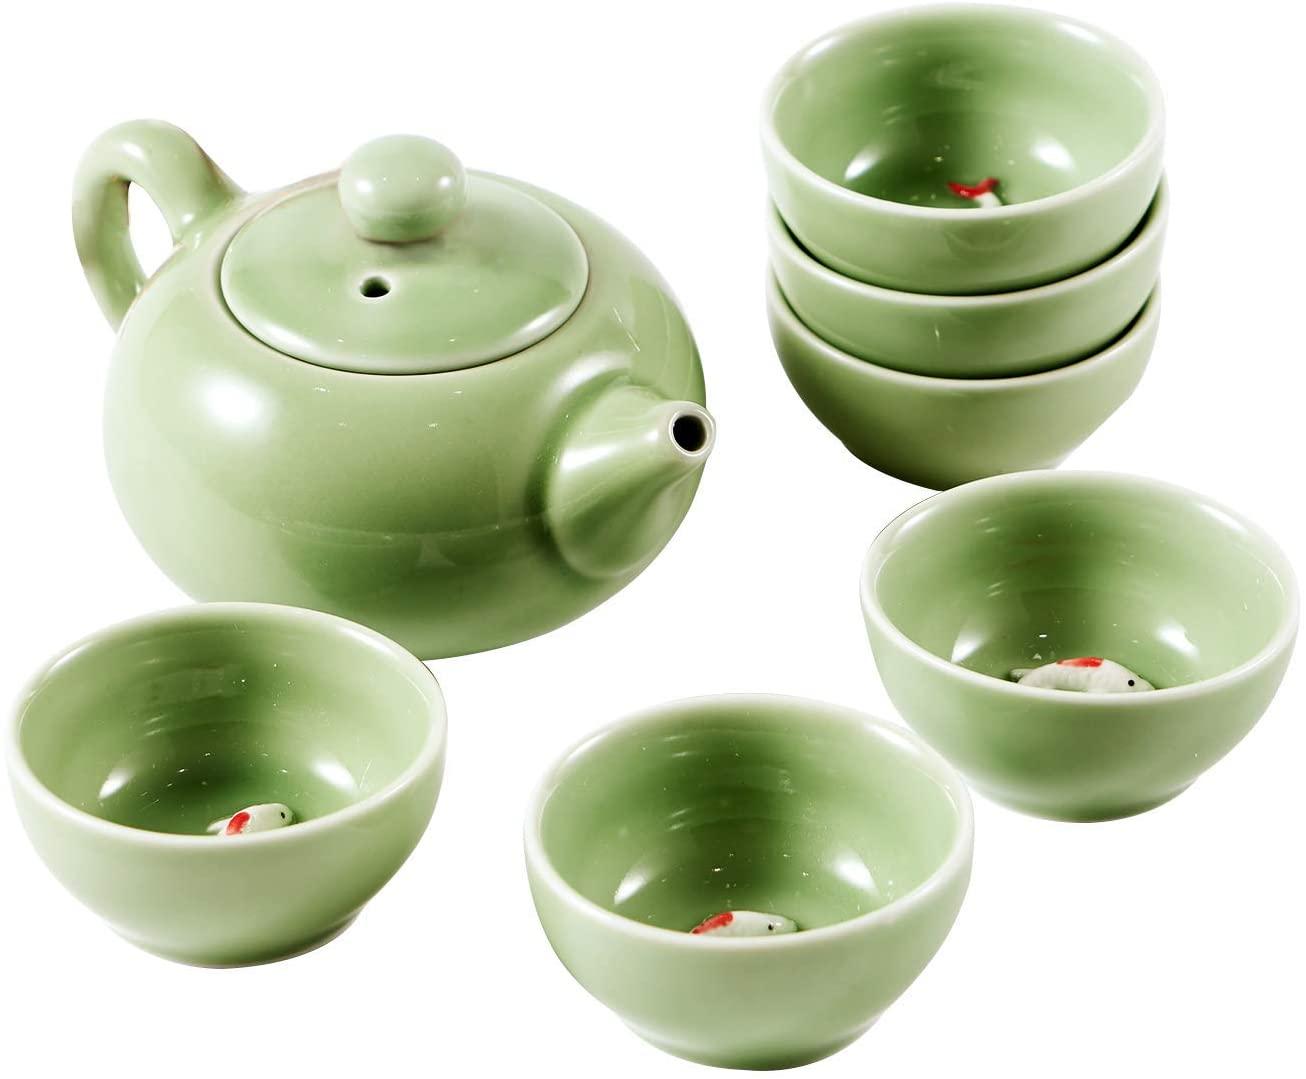 Chinese Kongfu Tea Set Ceramic Kung Fu Tea Cup Set Exquisite Oriental Porcelain Tea Ware Teapot Teacups China Tea Service Toy Tea Set for Home Office Use Gift (Green)